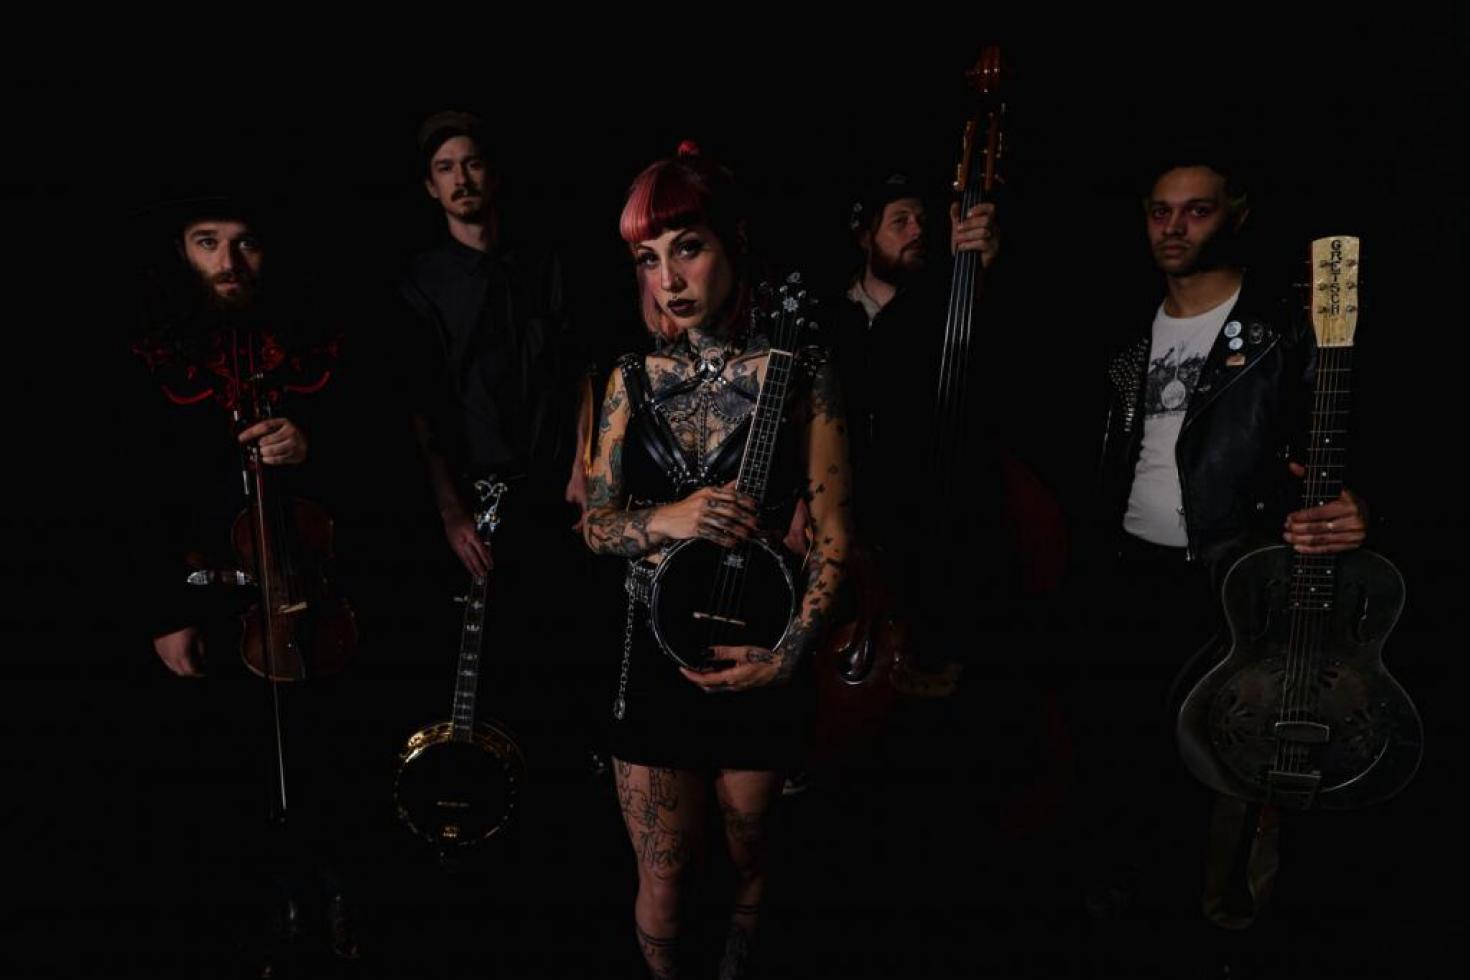 Track-by-track: Bridge City Sinners talk 'Unholy Hymns'